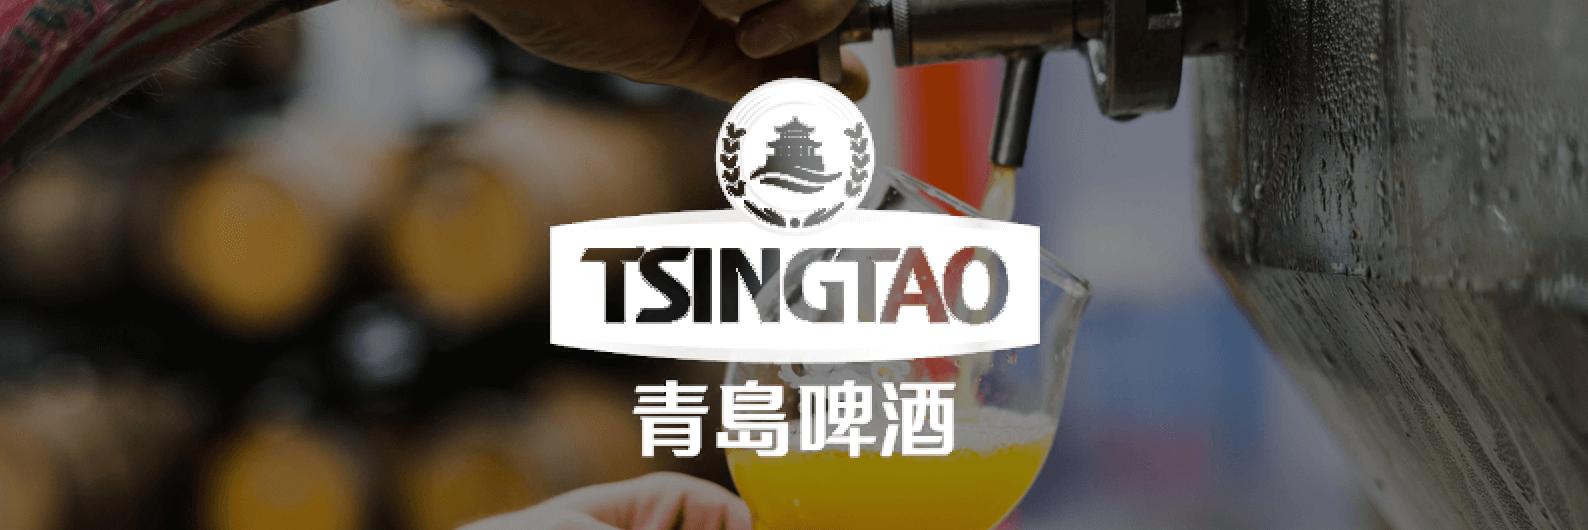 Tsingtao Brewery Co.